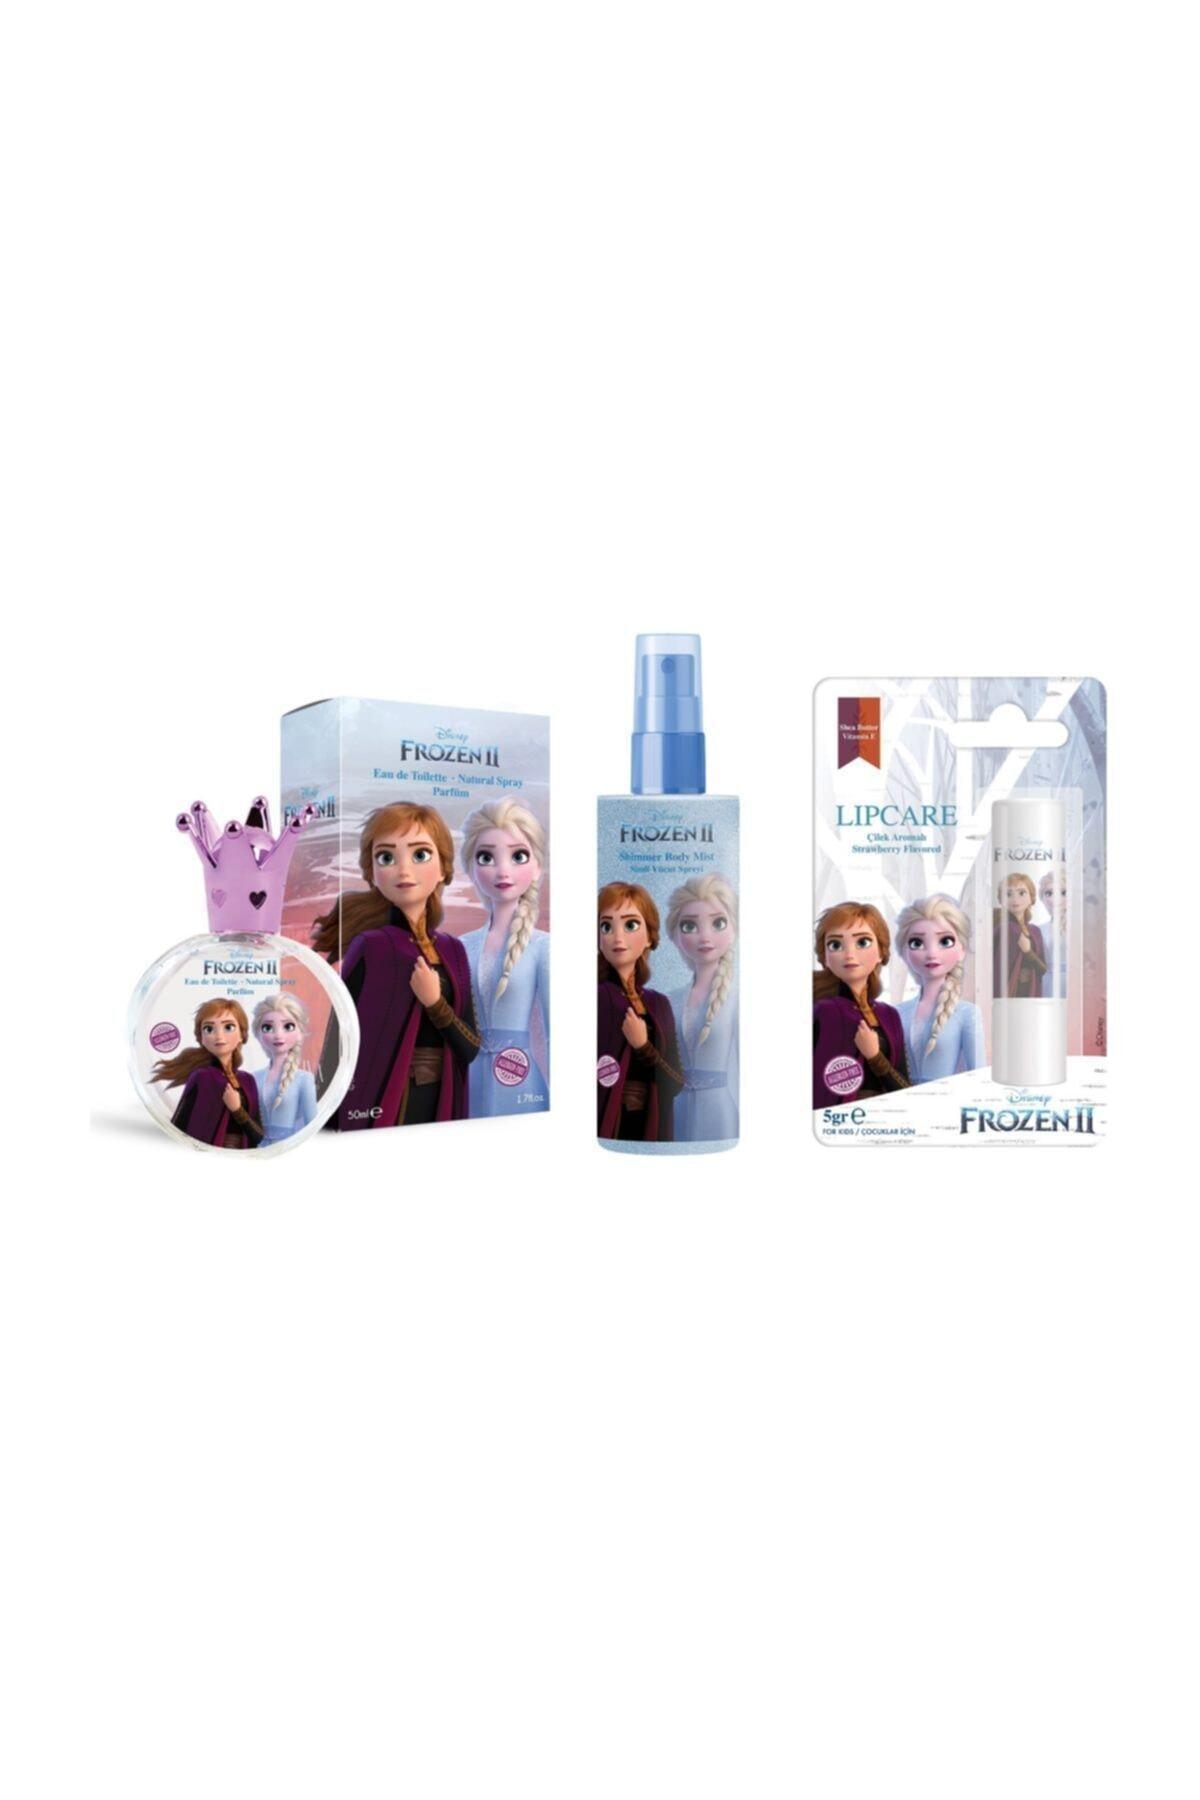 DISNEY Frozen Elsa 50ml Parfüm Edt + Body Mist + Lip Stick 1